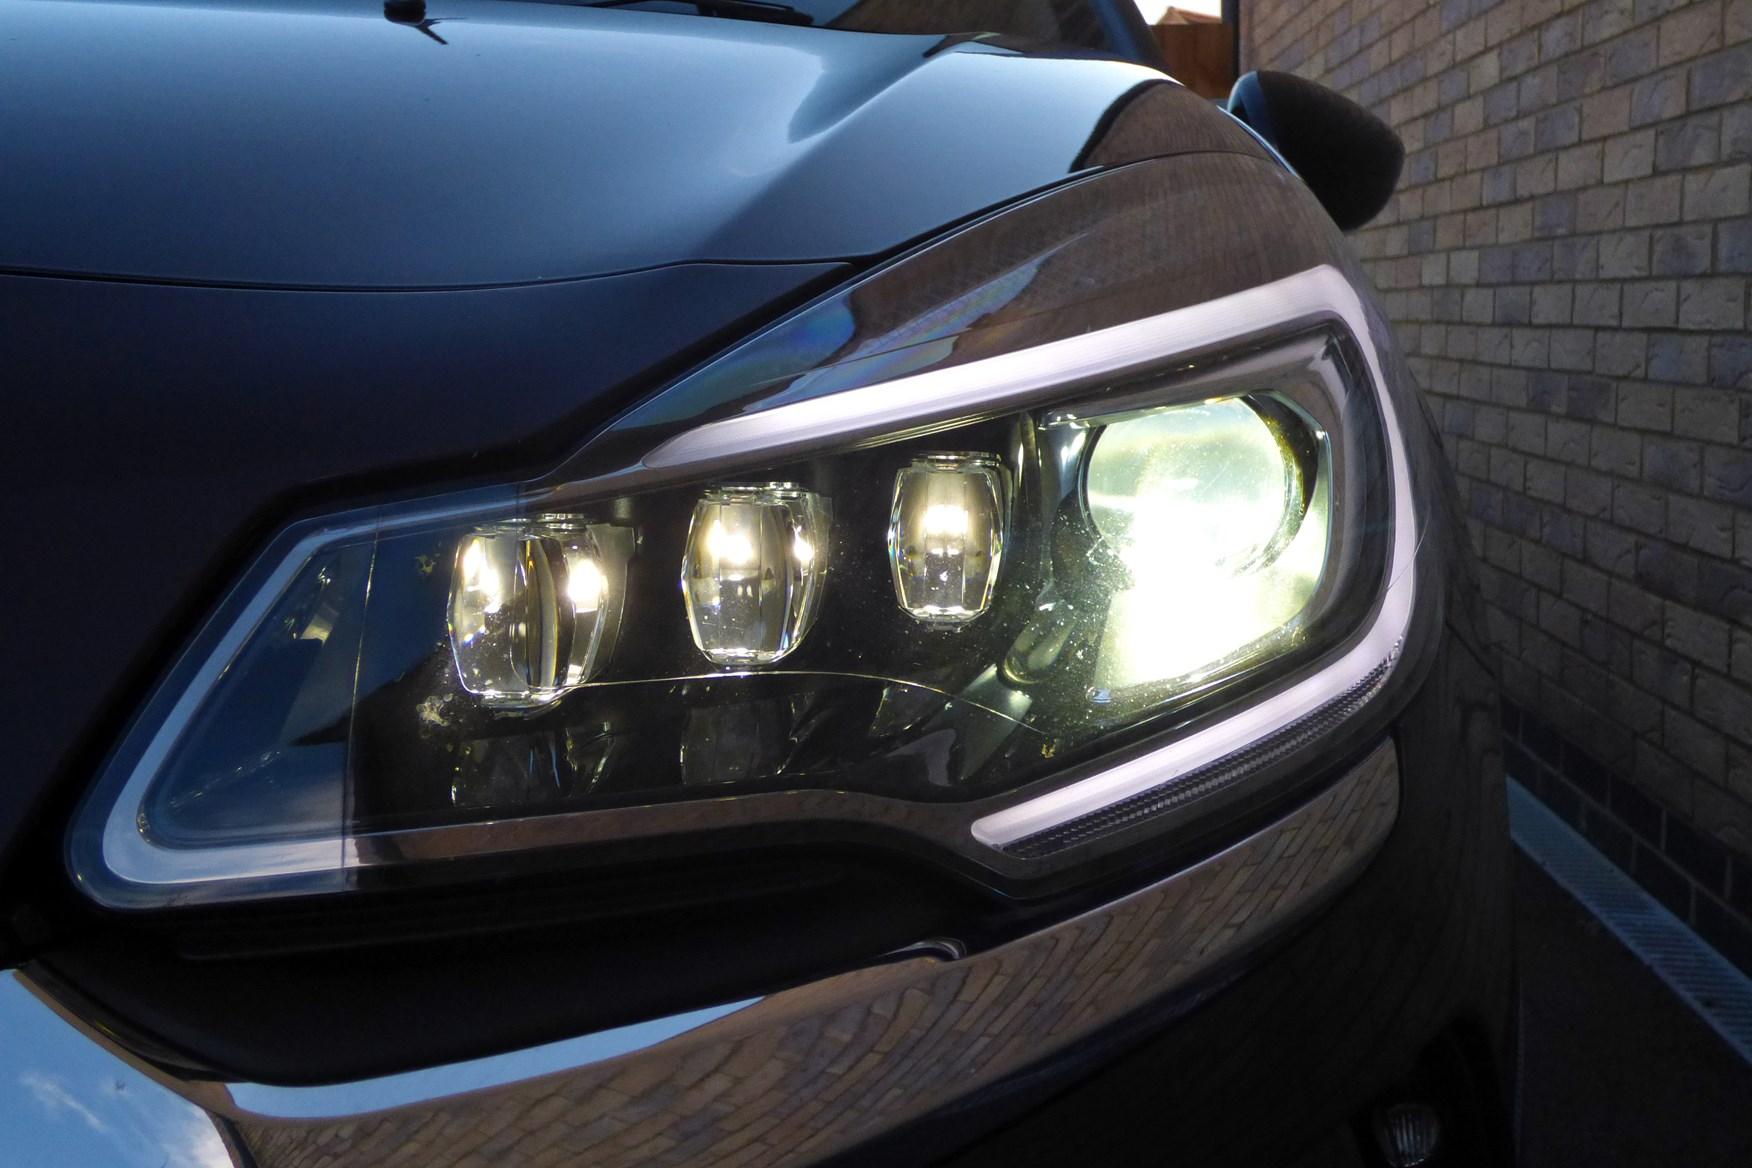 DS 3 LED headlight option